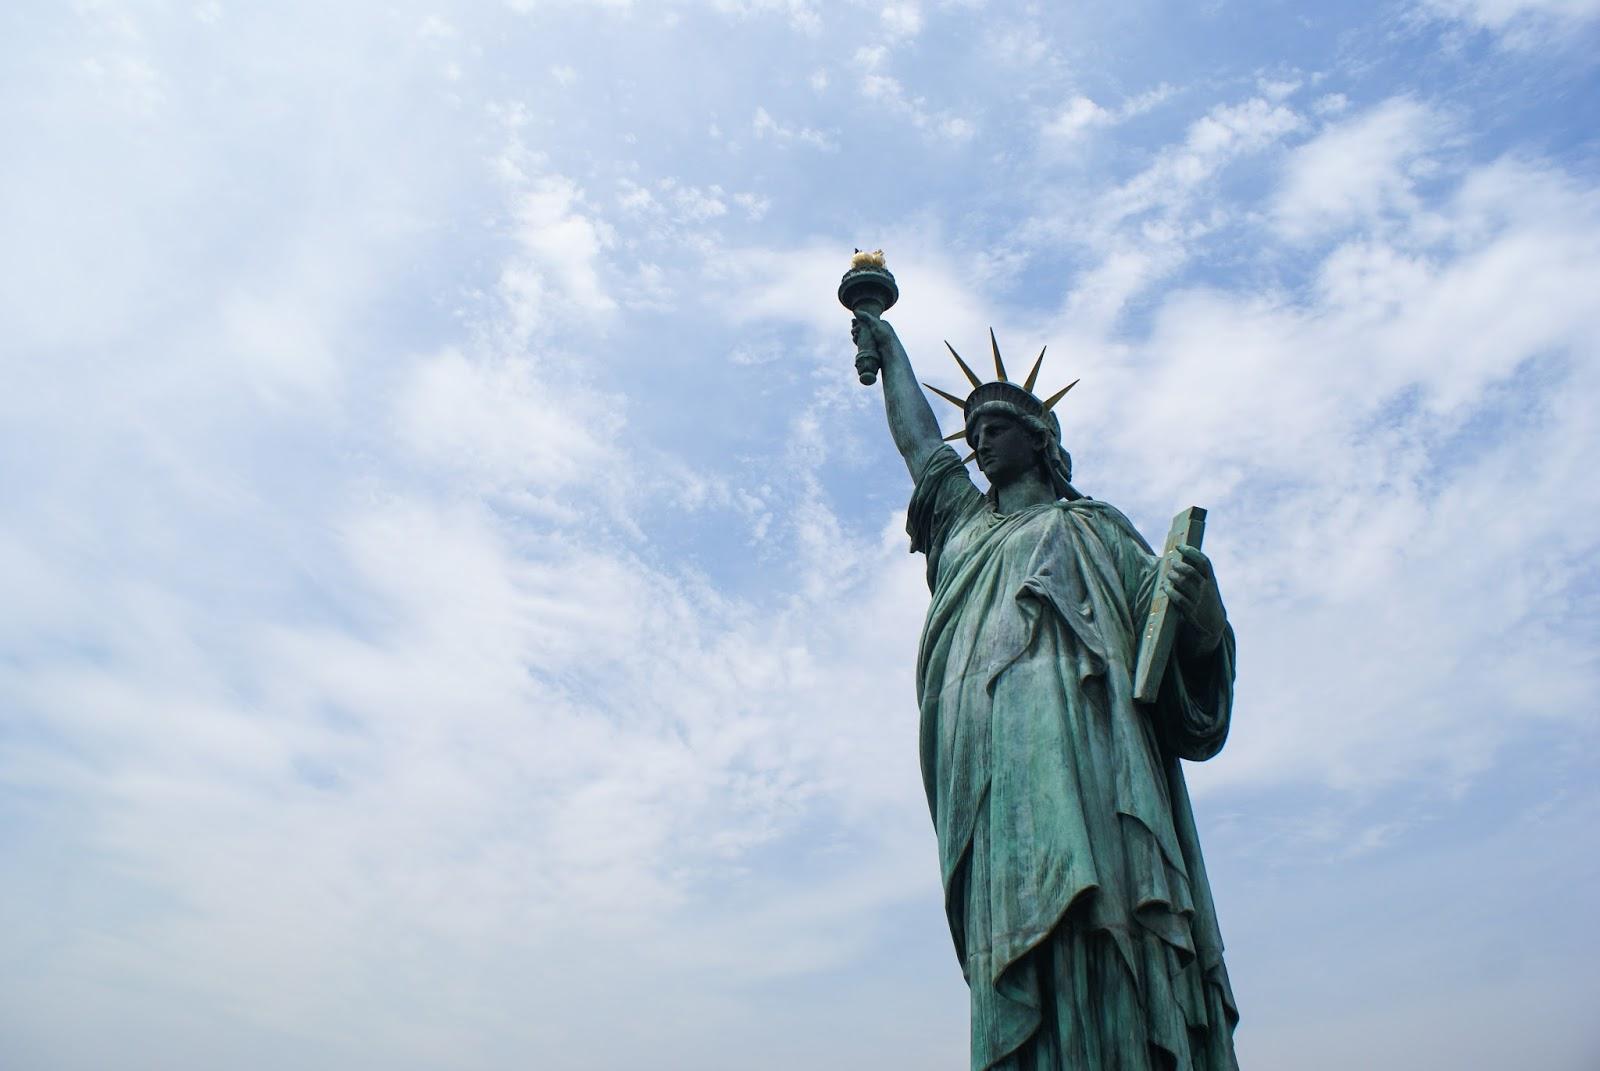 tokyo odaiba japan statue of liberty